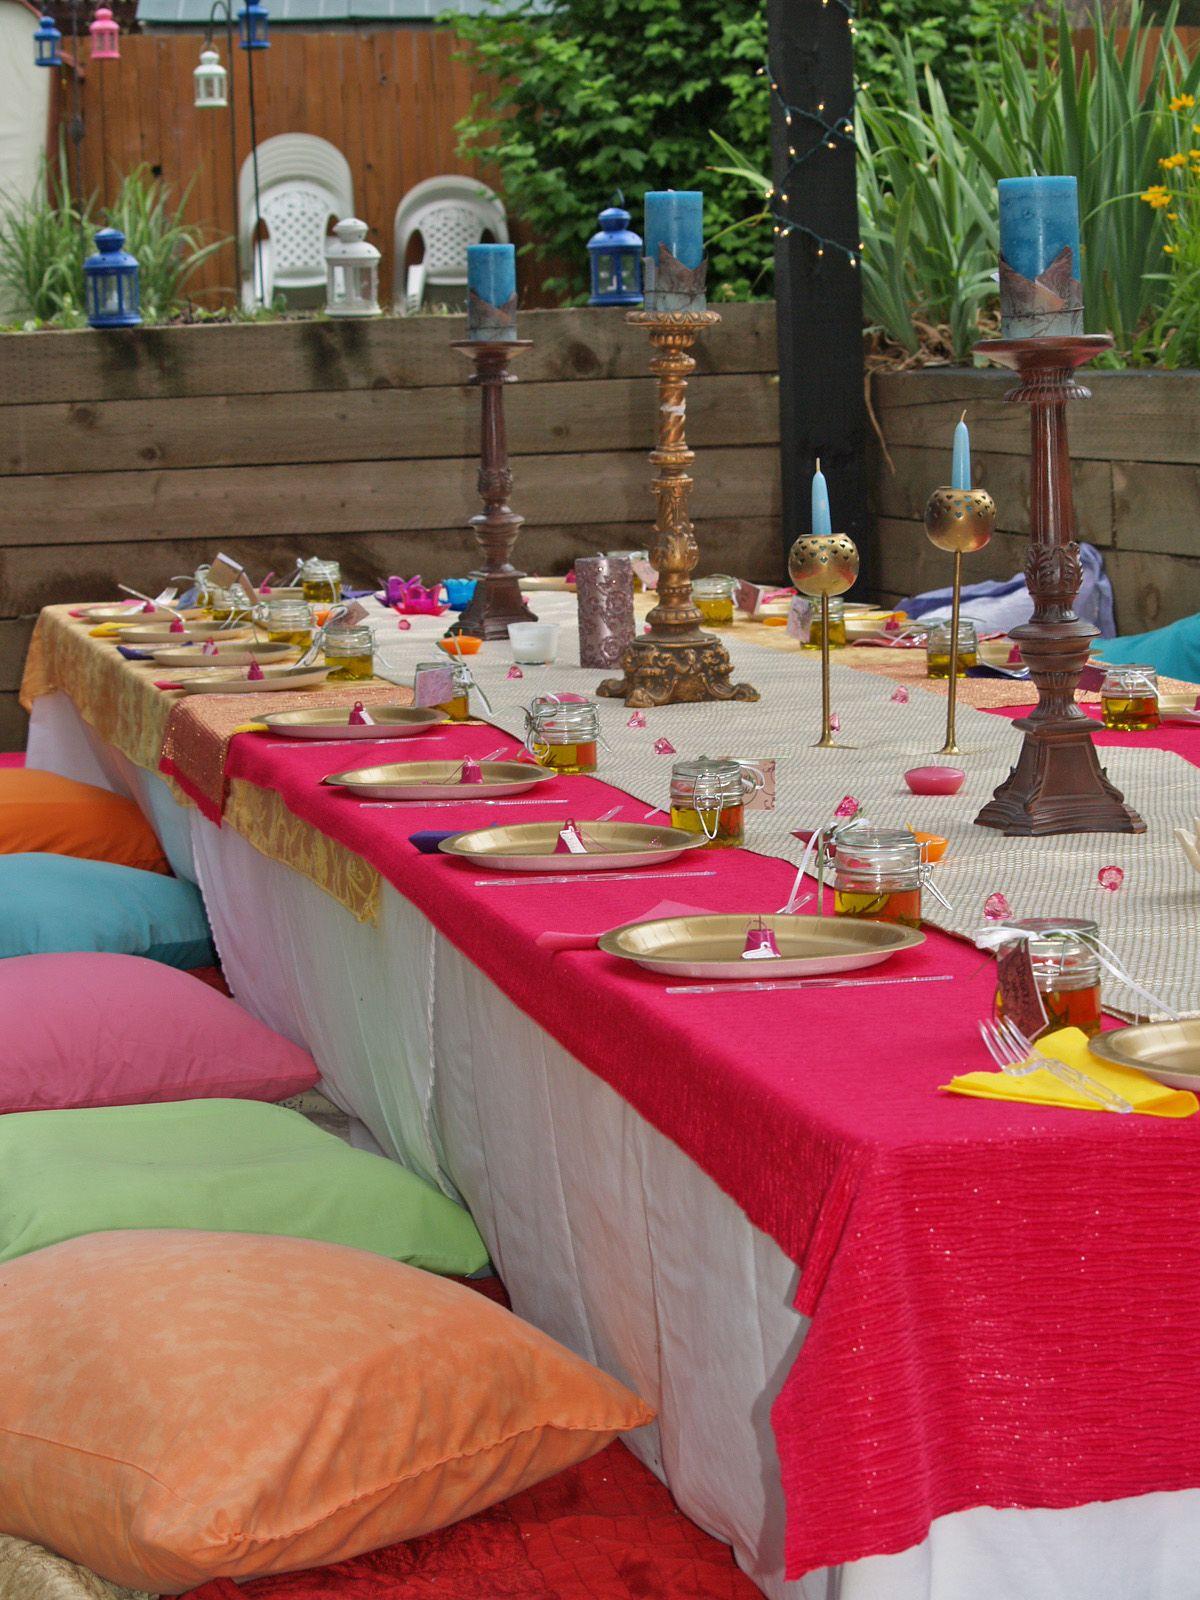 diy moroccan themed backyard bridal shower floor seating orange pink white blue purple draping olive oil favors